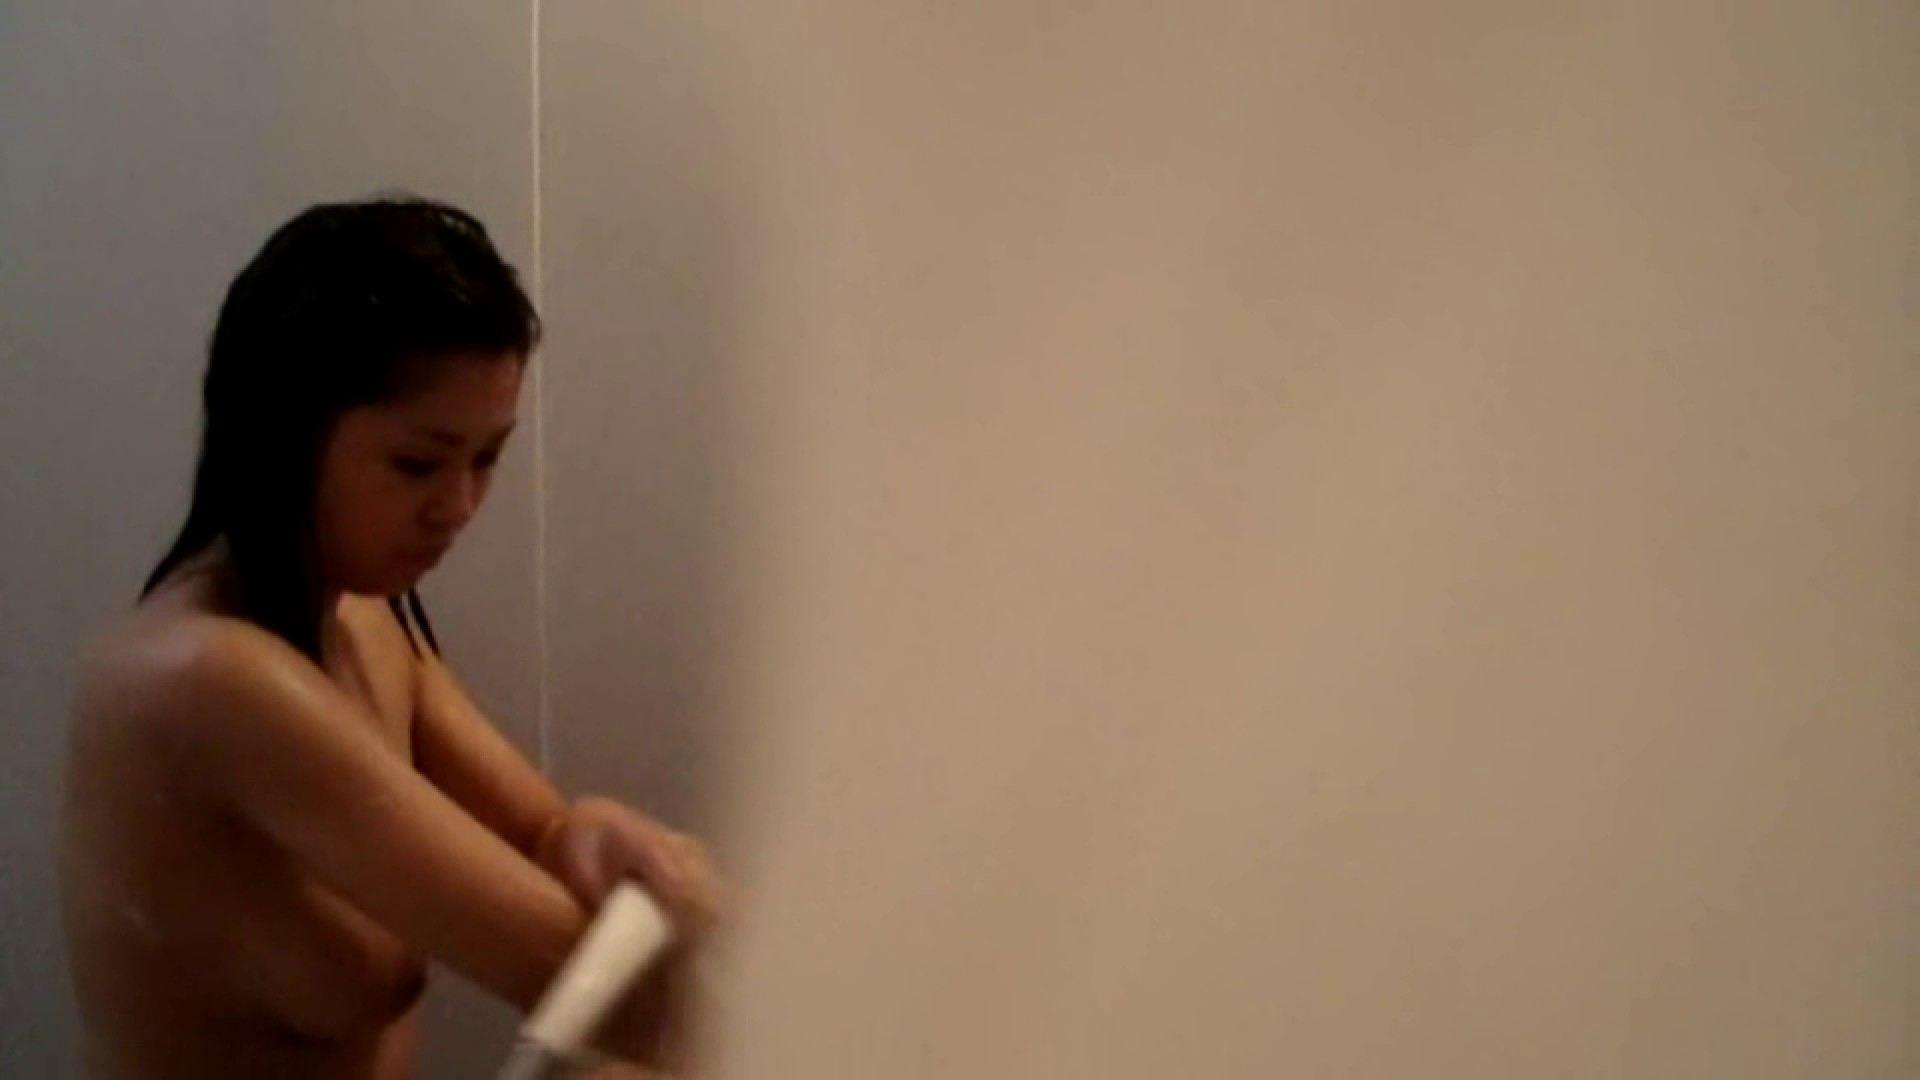 Vol.02 葵のグラドル顔負けの爆乳を入浴シーンでどうぞ。 爆乳 性交動画流出 55連発 55